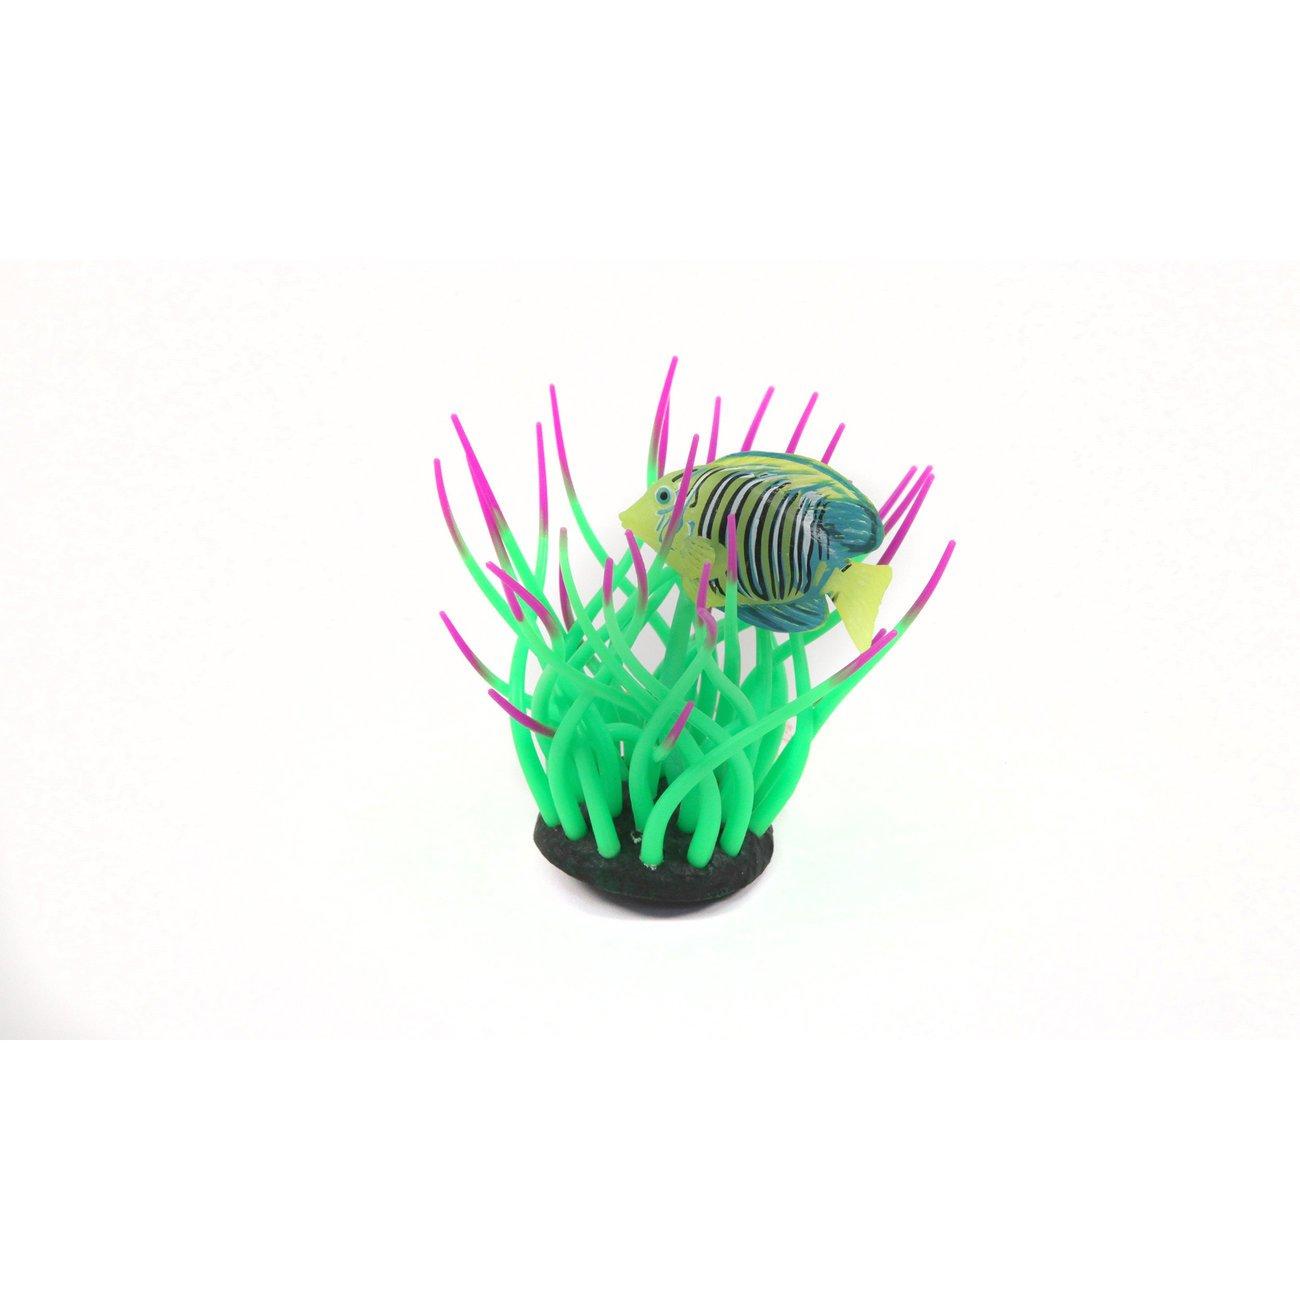 Aquatlantis Aqua Glow Anemone, Bild 9